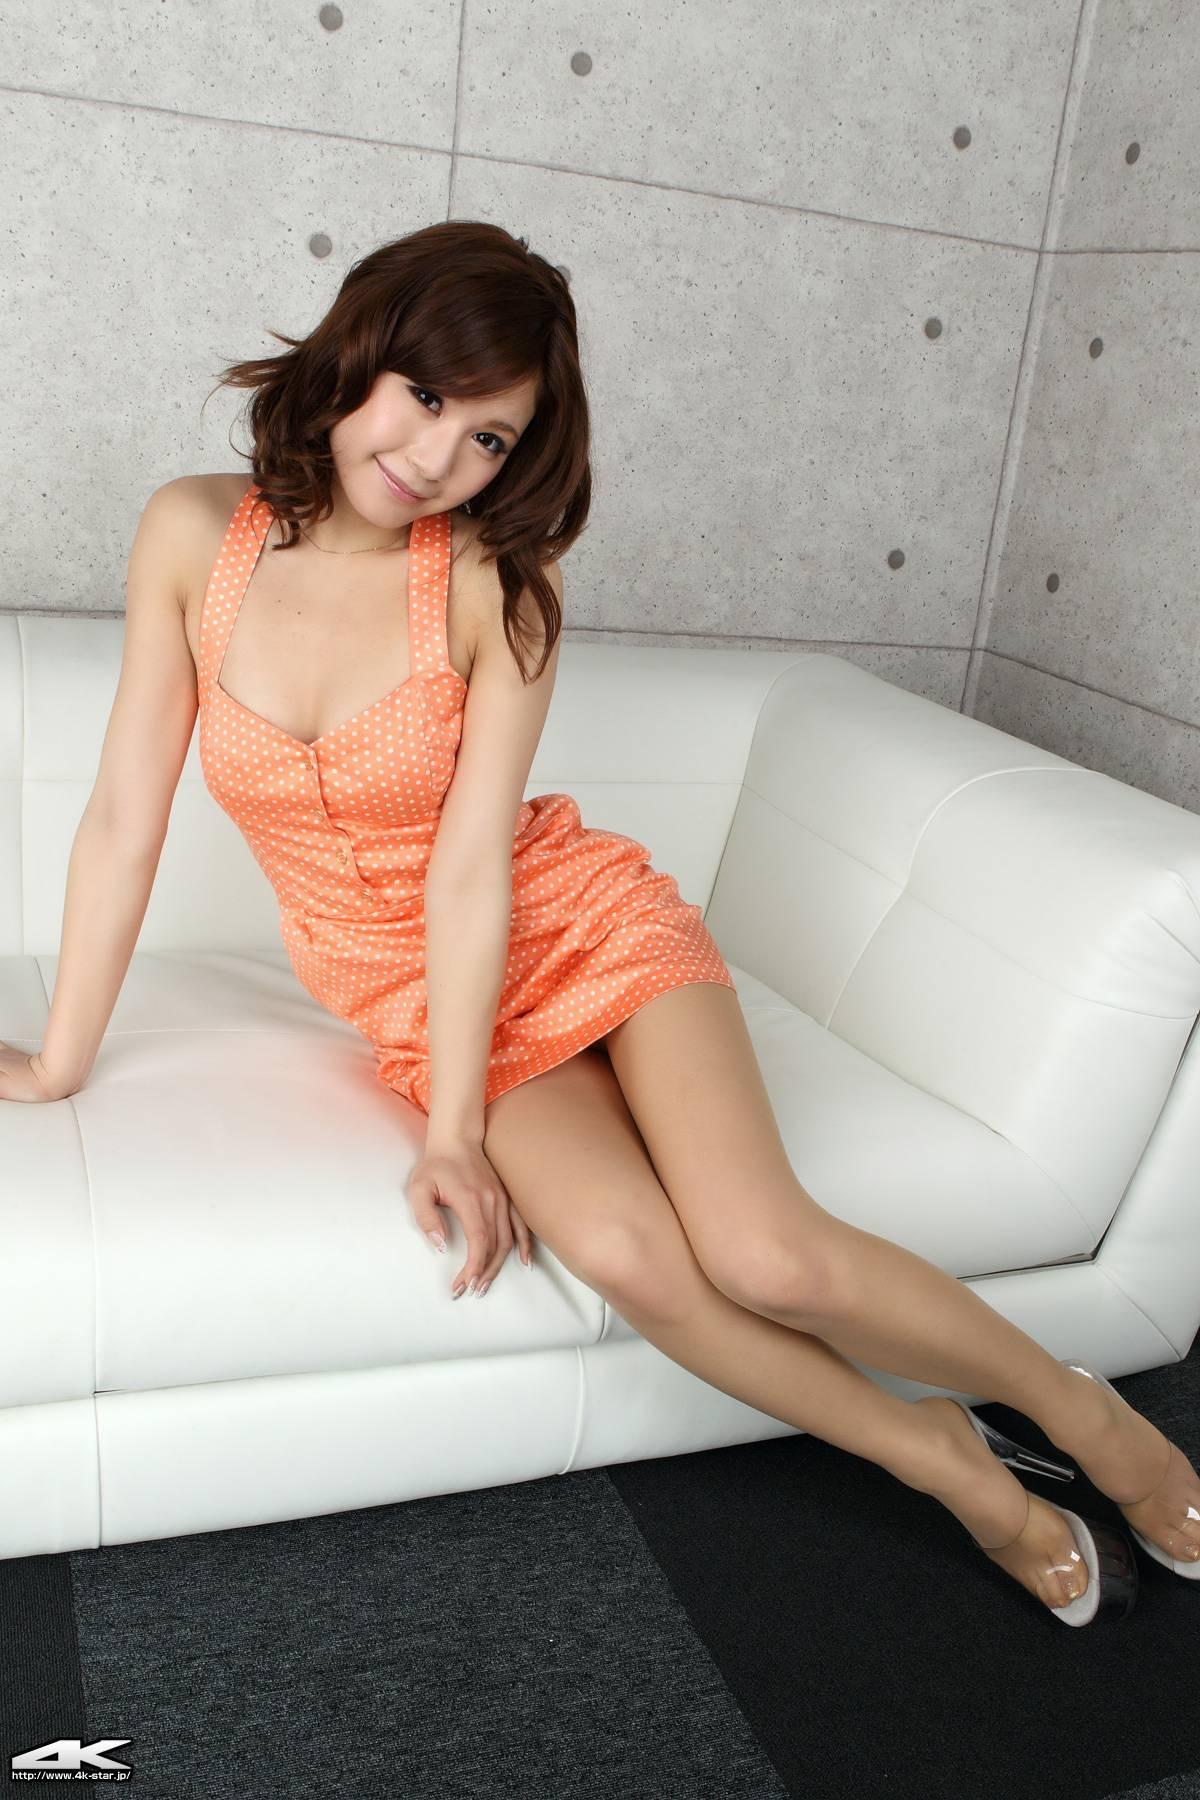 4k-star套图 NO.00011 熊乃あい「私服」日本性感美女